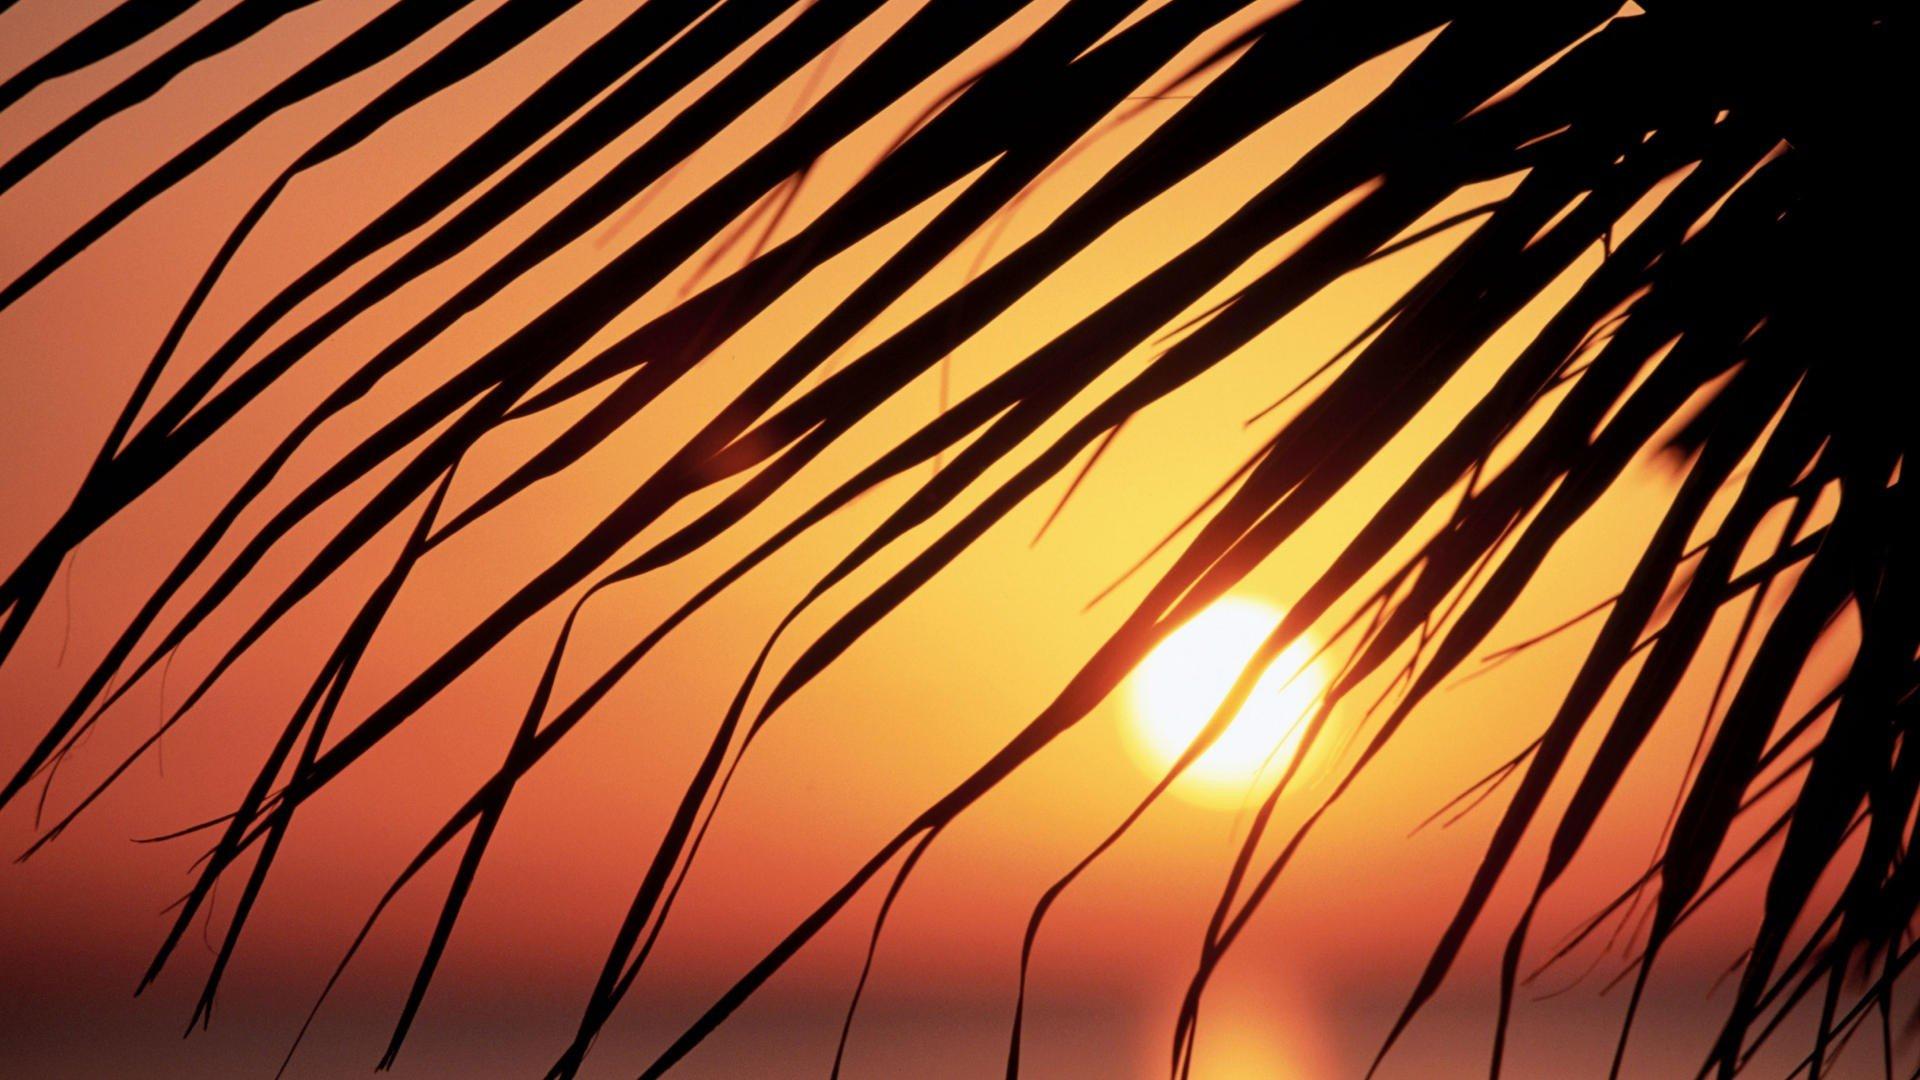 Sunset Leaf Sun Silhouettes